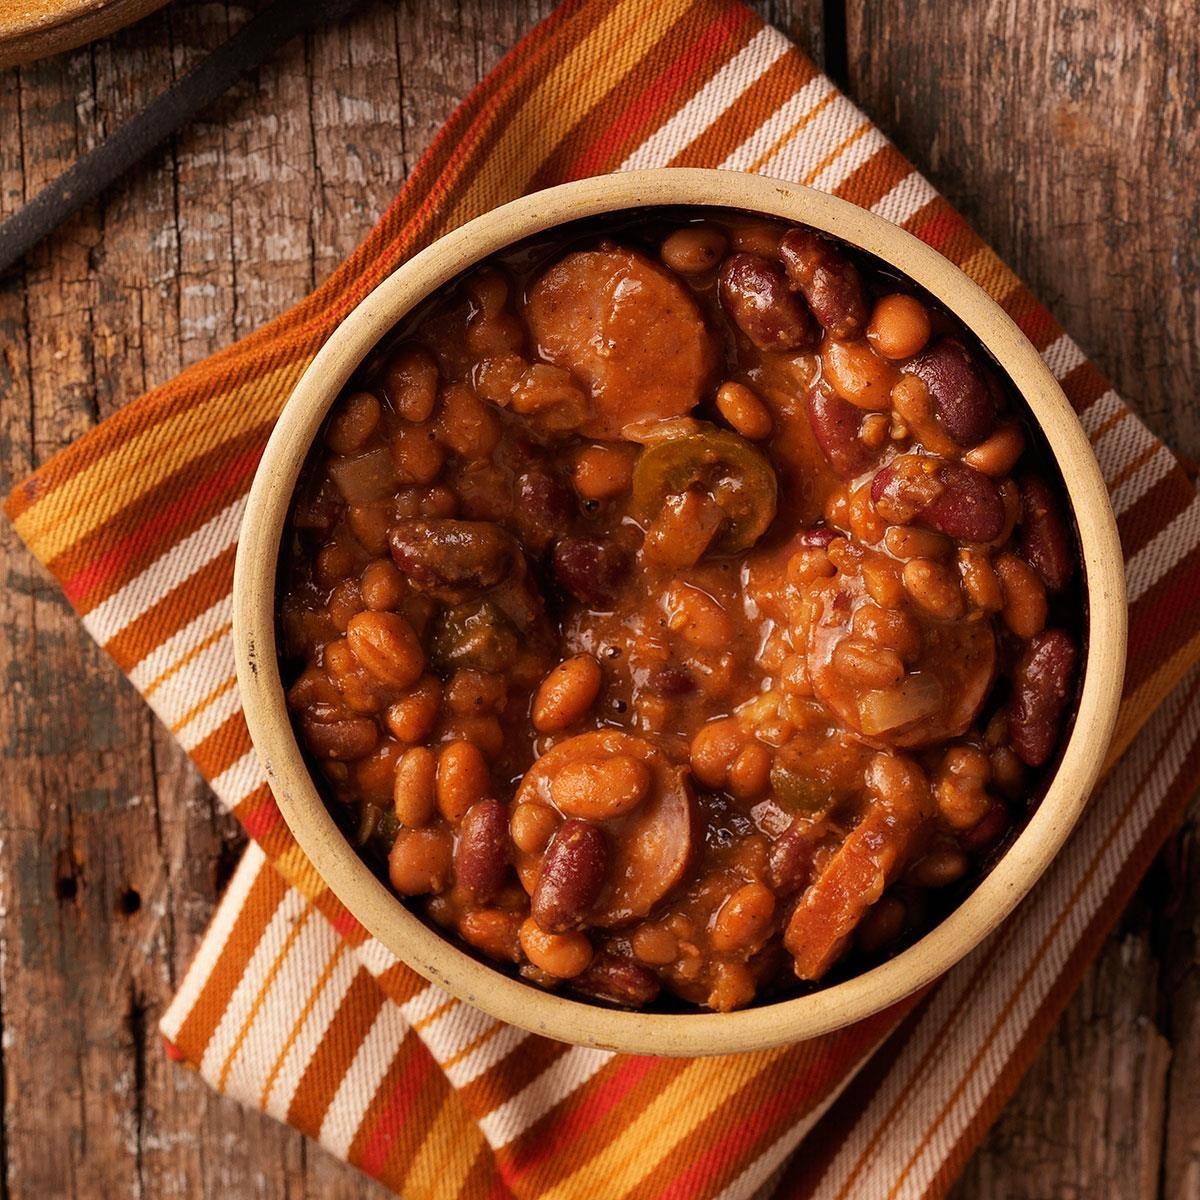 Chuck Wagon Beans with Sausage